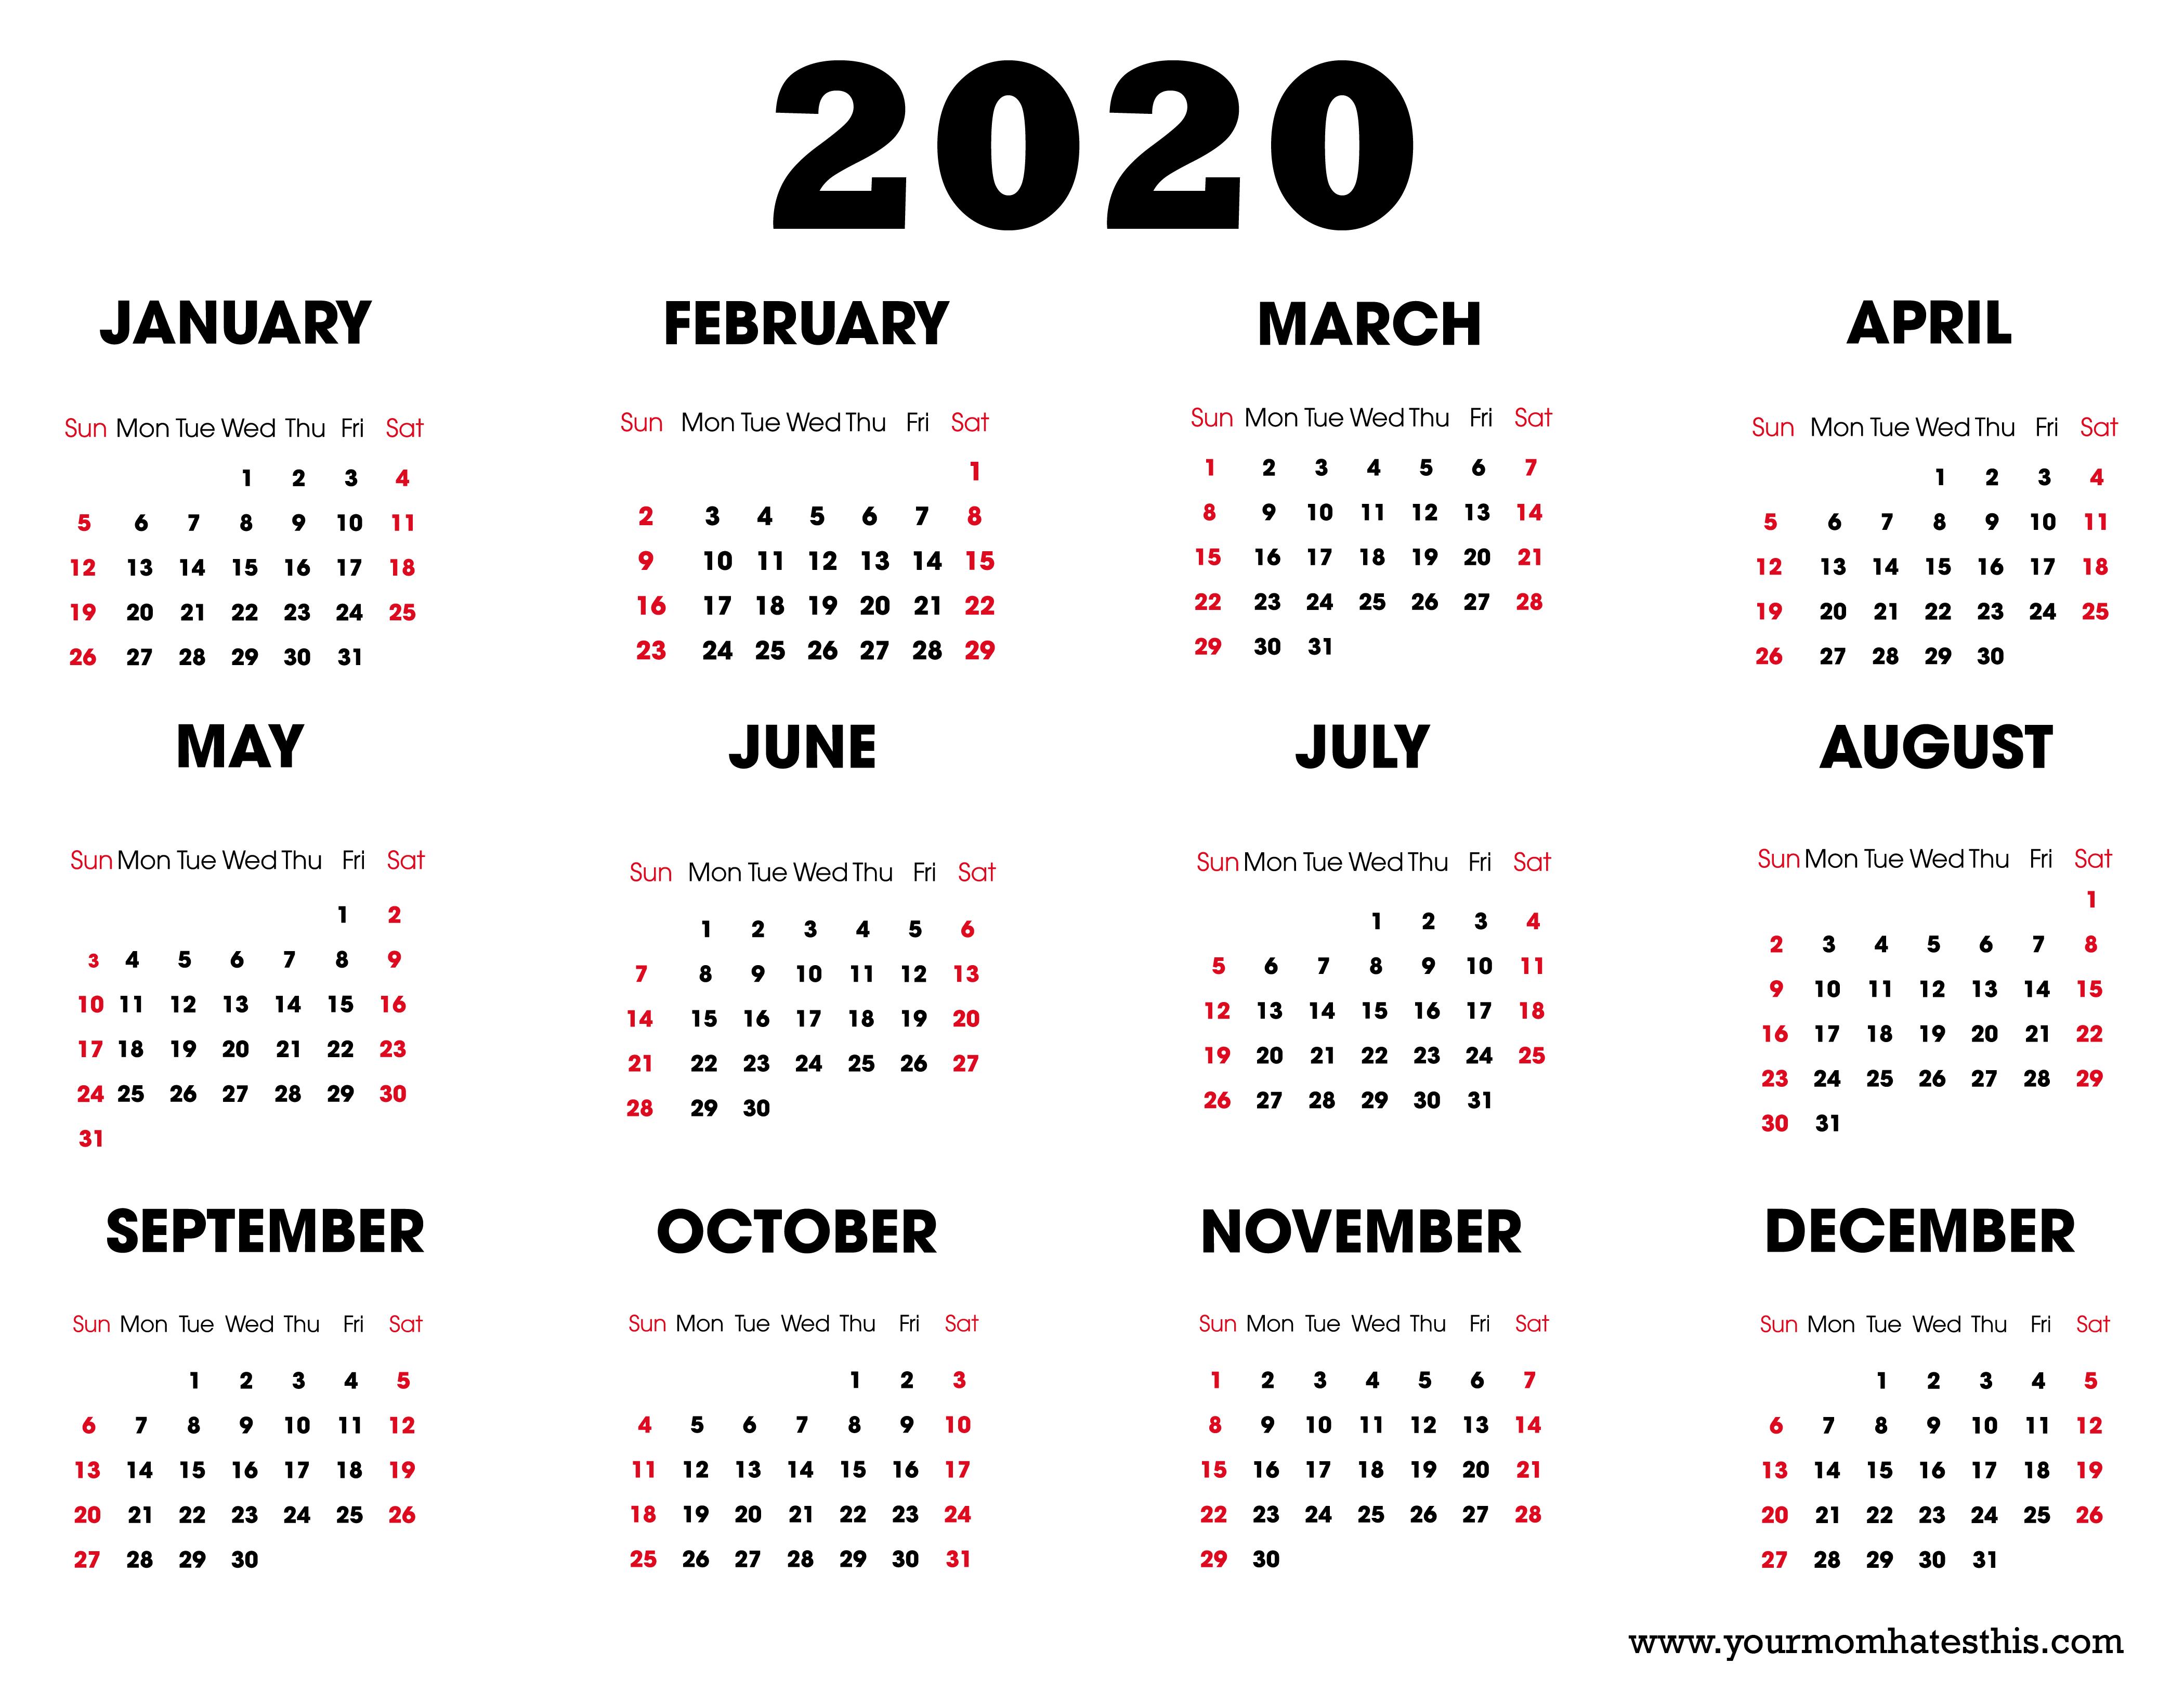 Calendar Pdf 2020 - Wpa.wpart.co intended for I-9 Form 2020 Pdf